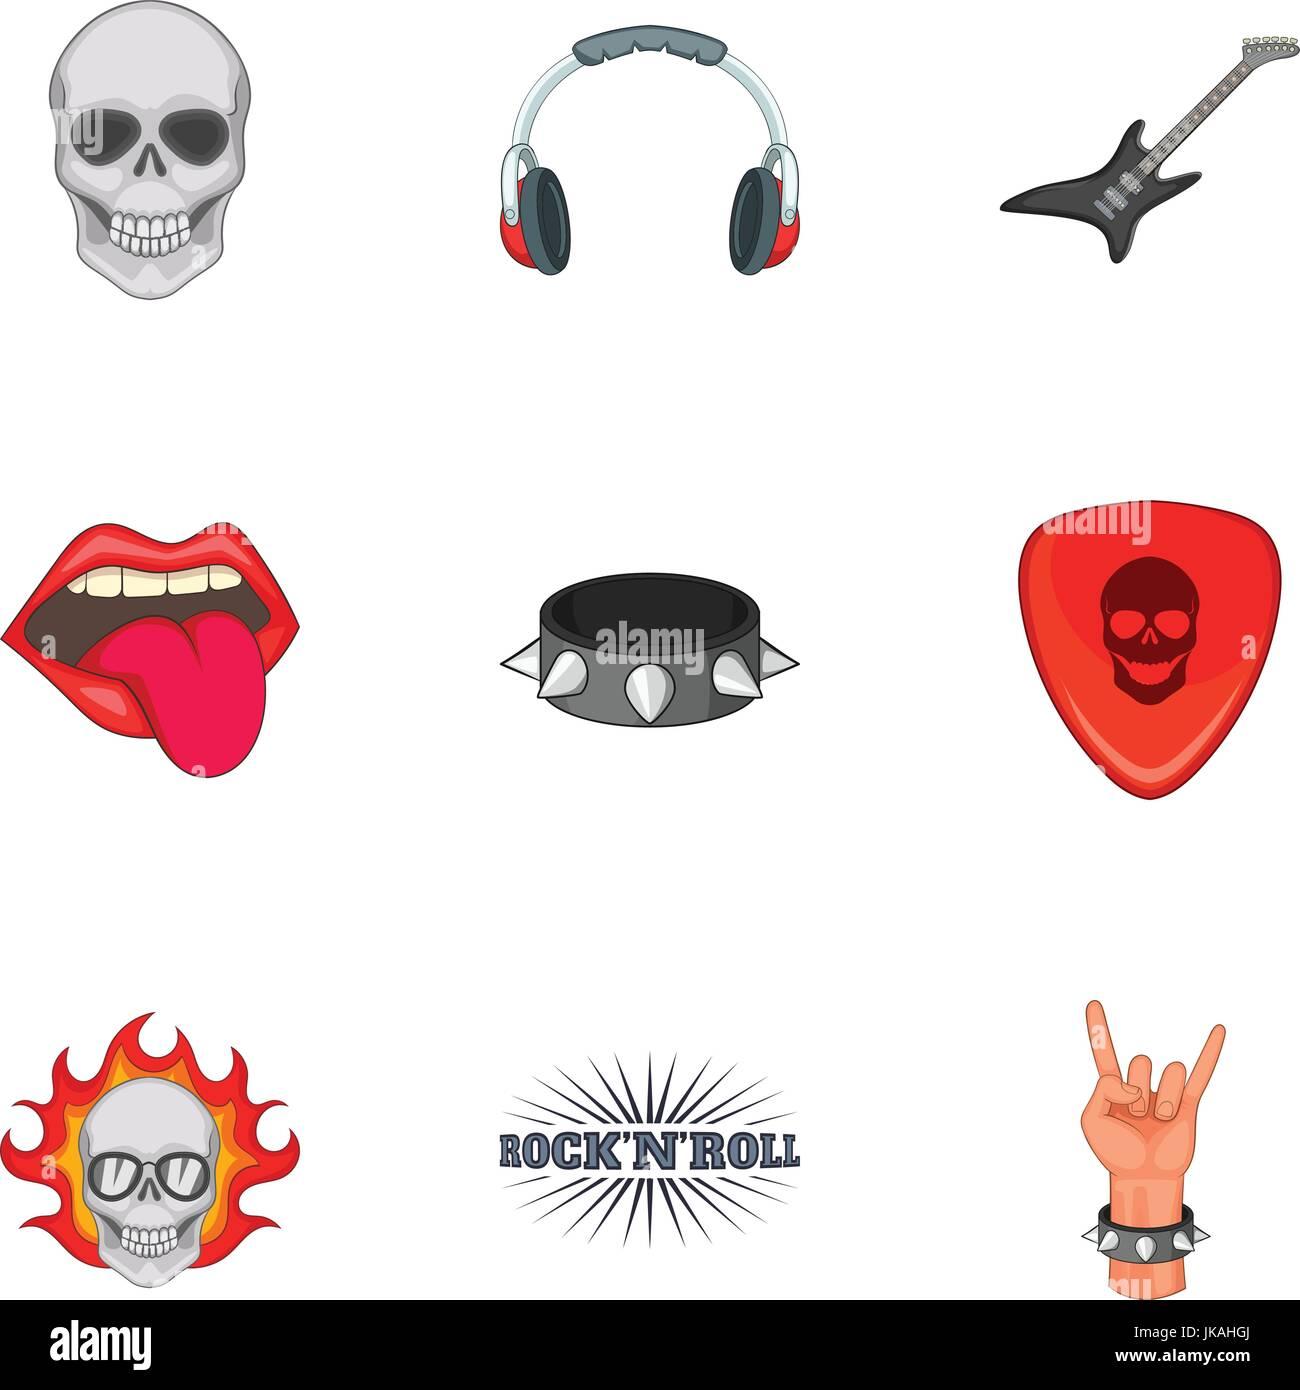 6c258762e Rock n roll sticker icons set, cartoon style Stock Vector Art ...